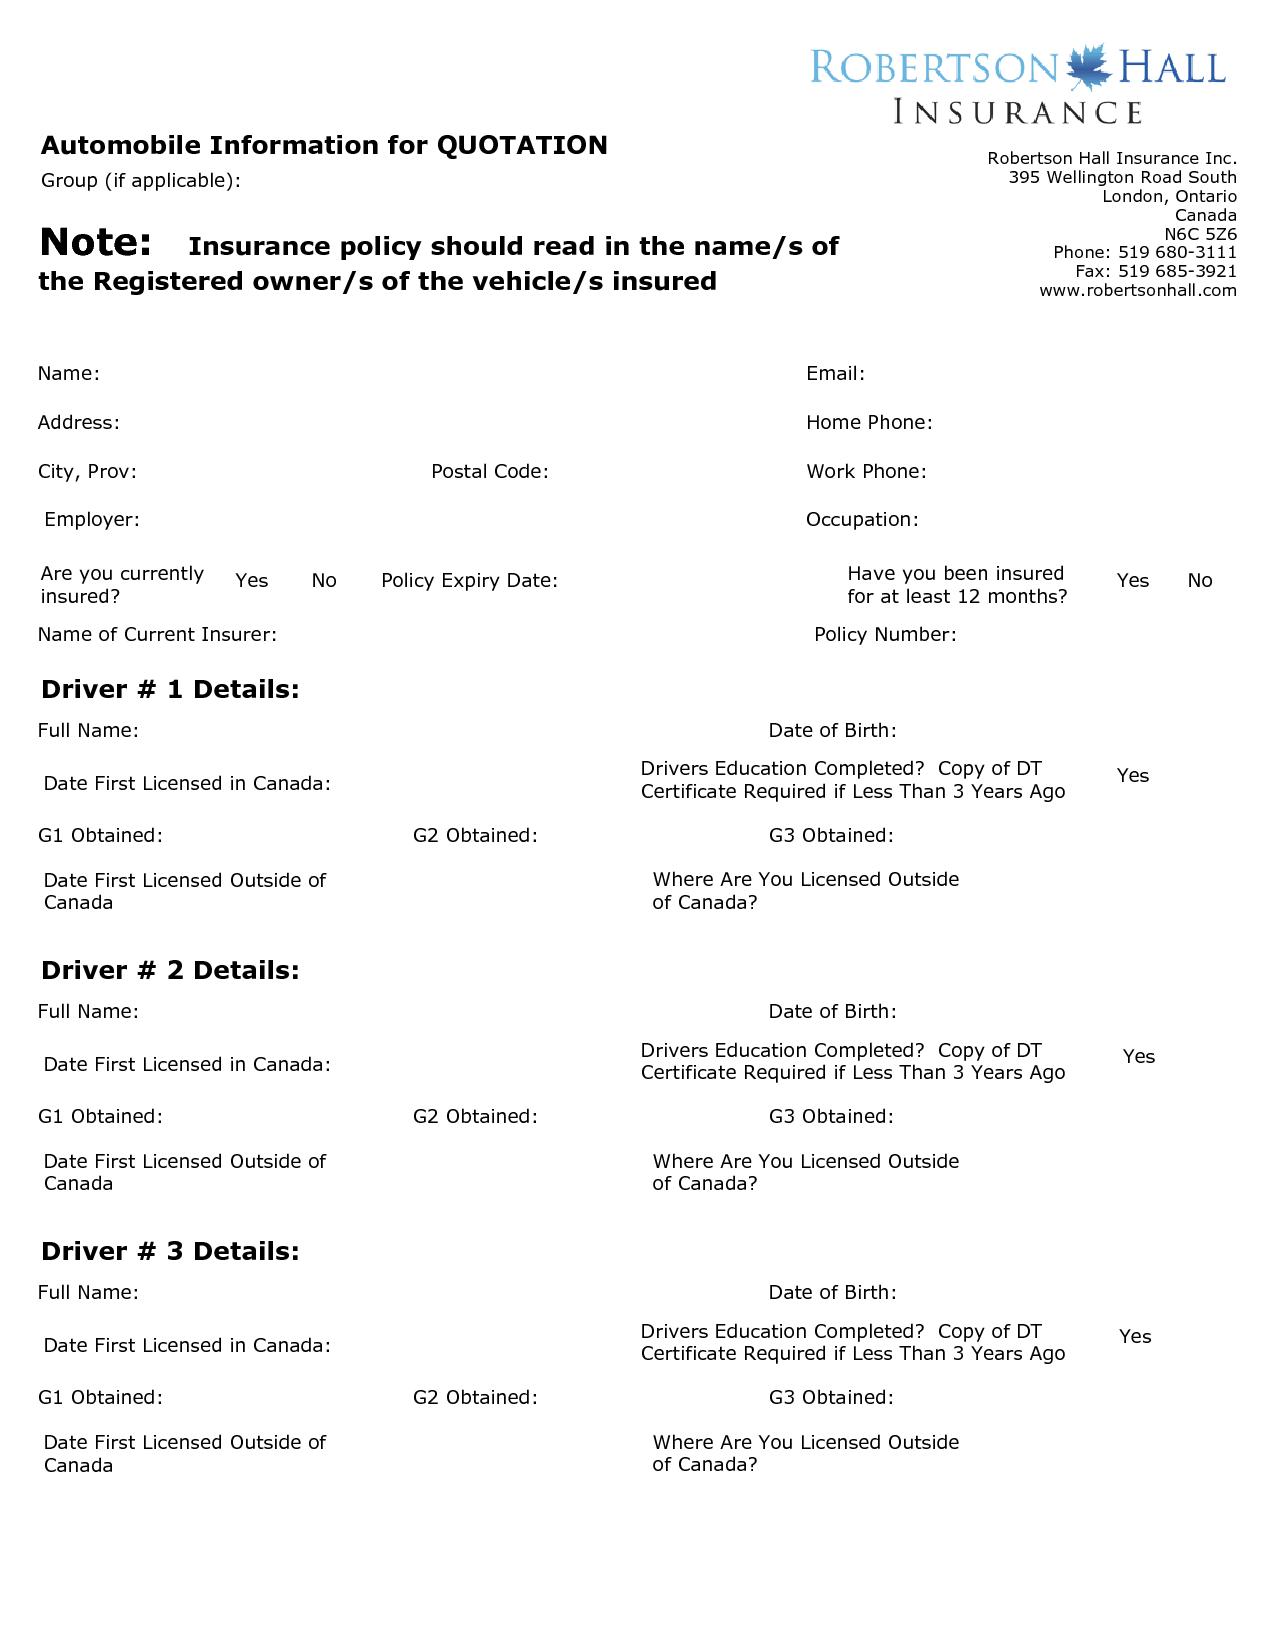 Quick Quote Life Insurance 19